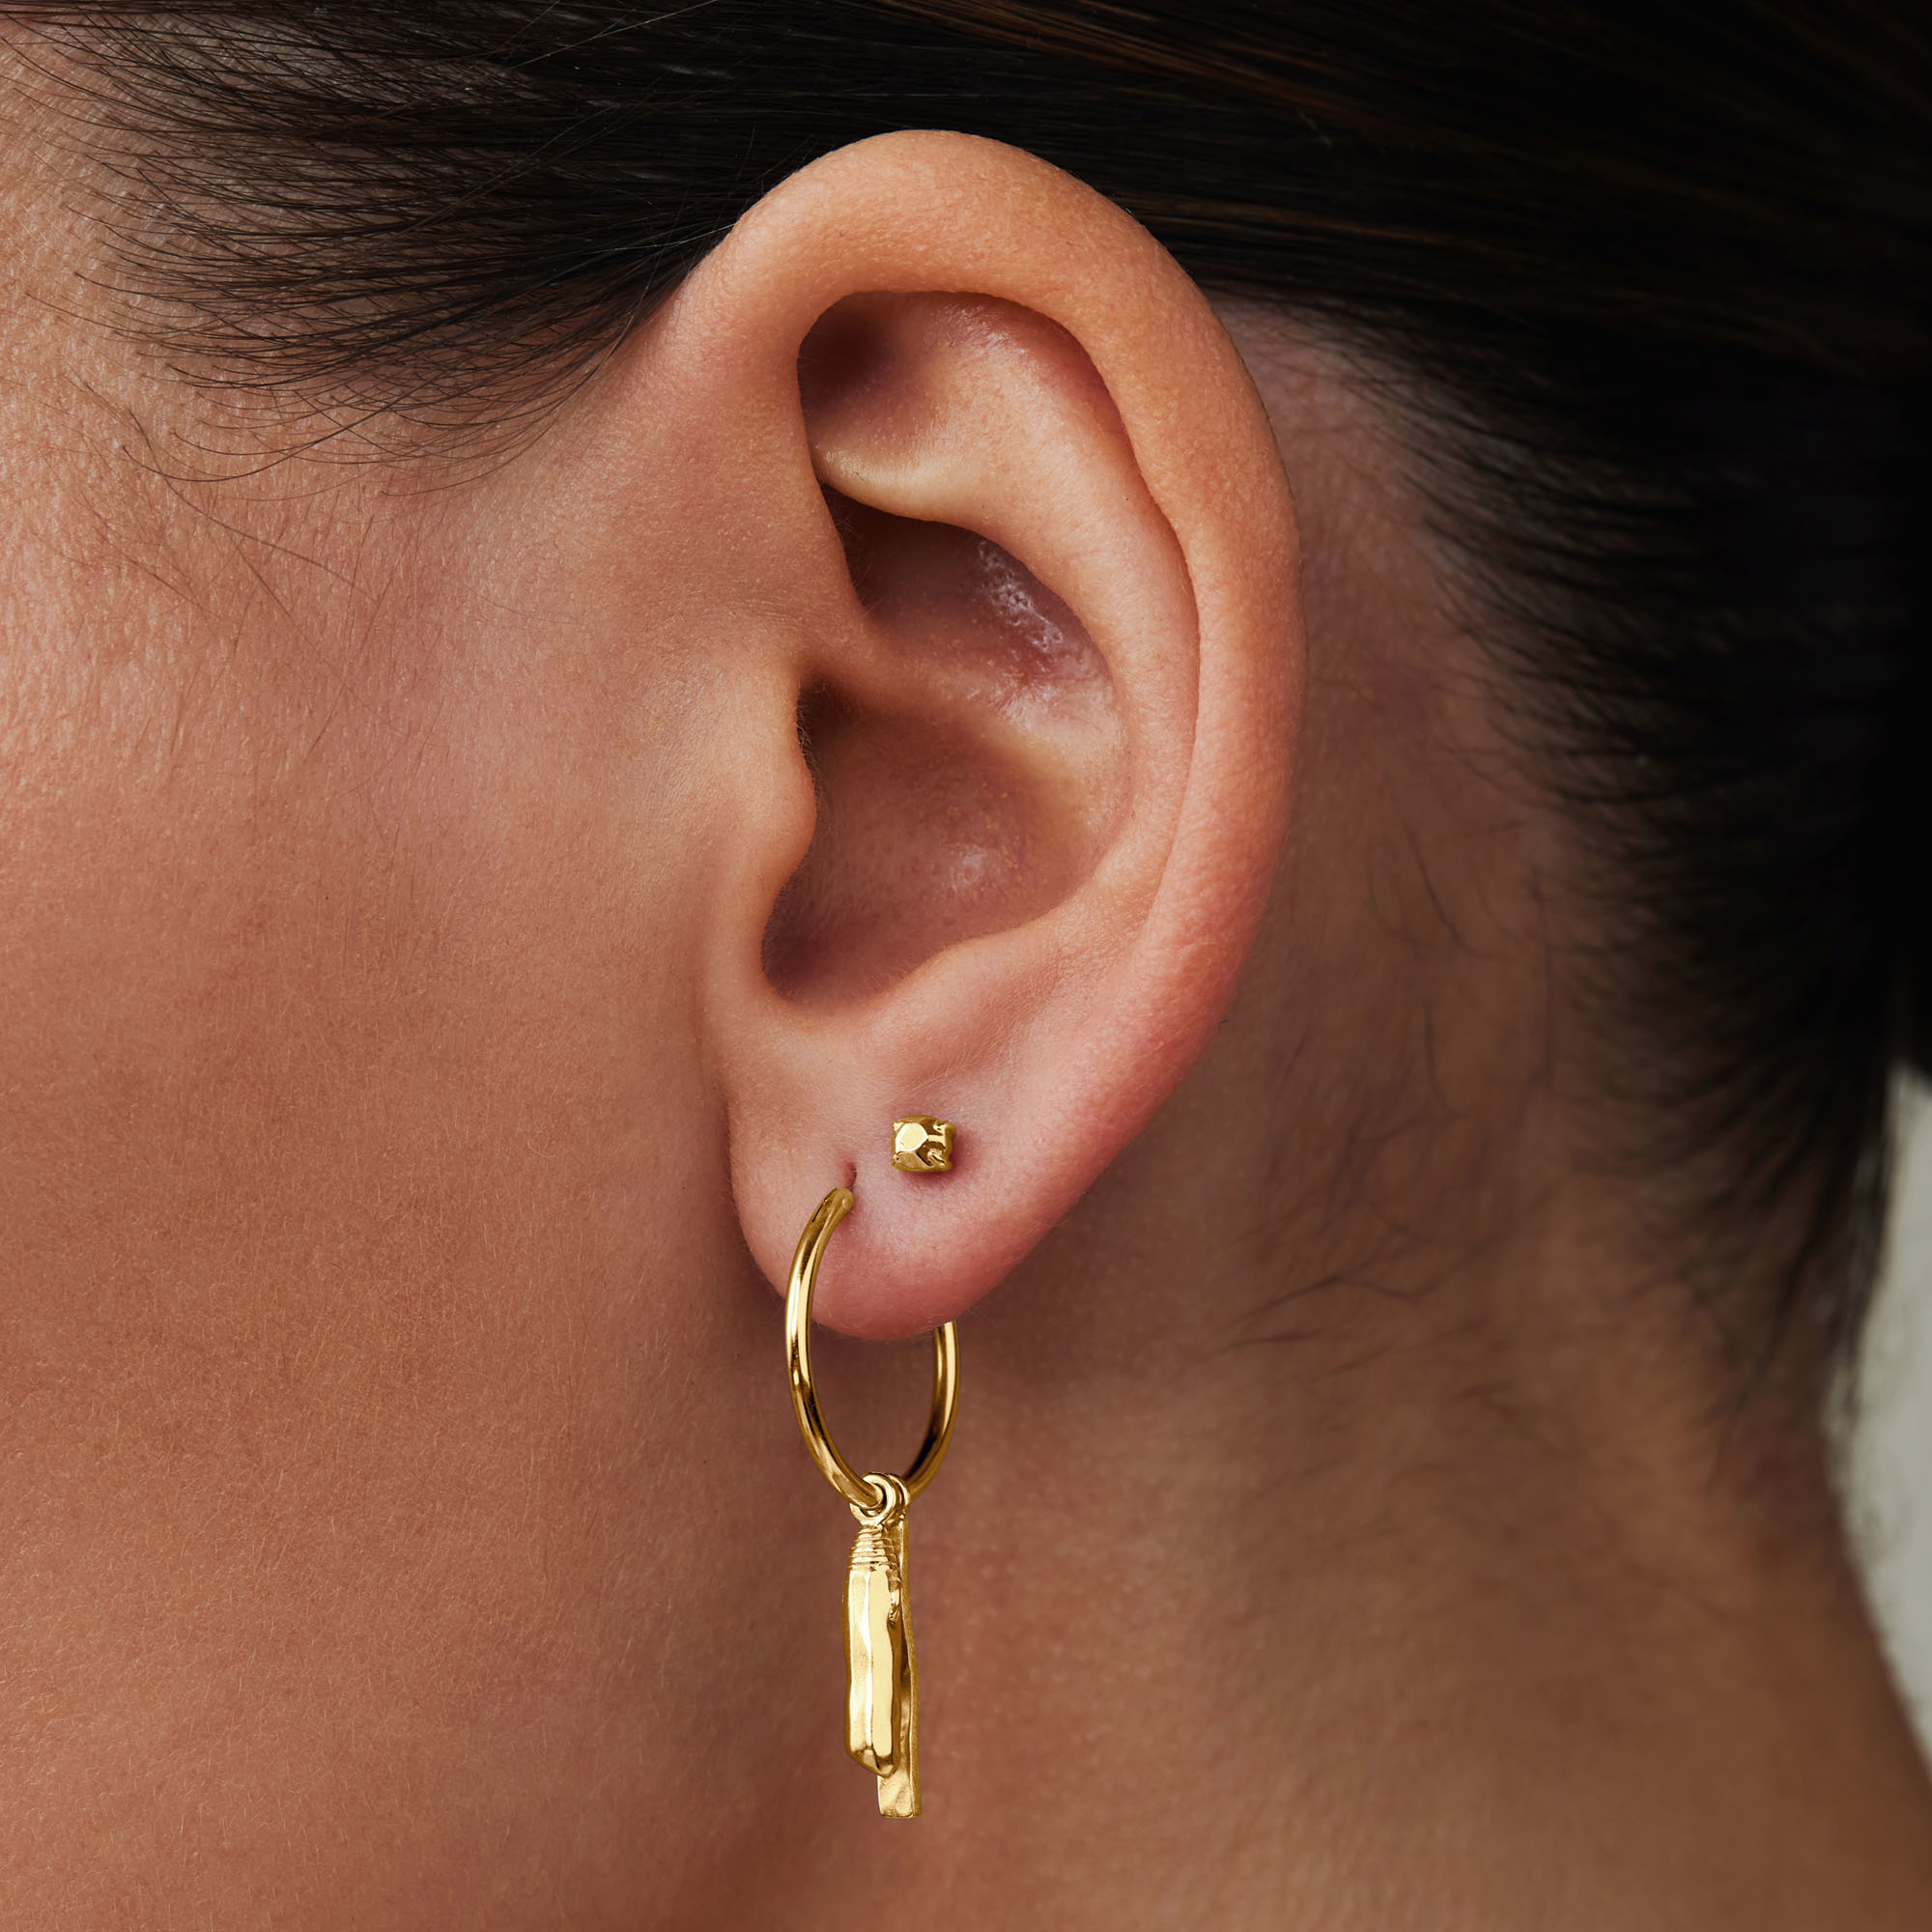 Violet Hamden Sisterhood Mona 925 sterling silver gold colored hoop earrings with rods